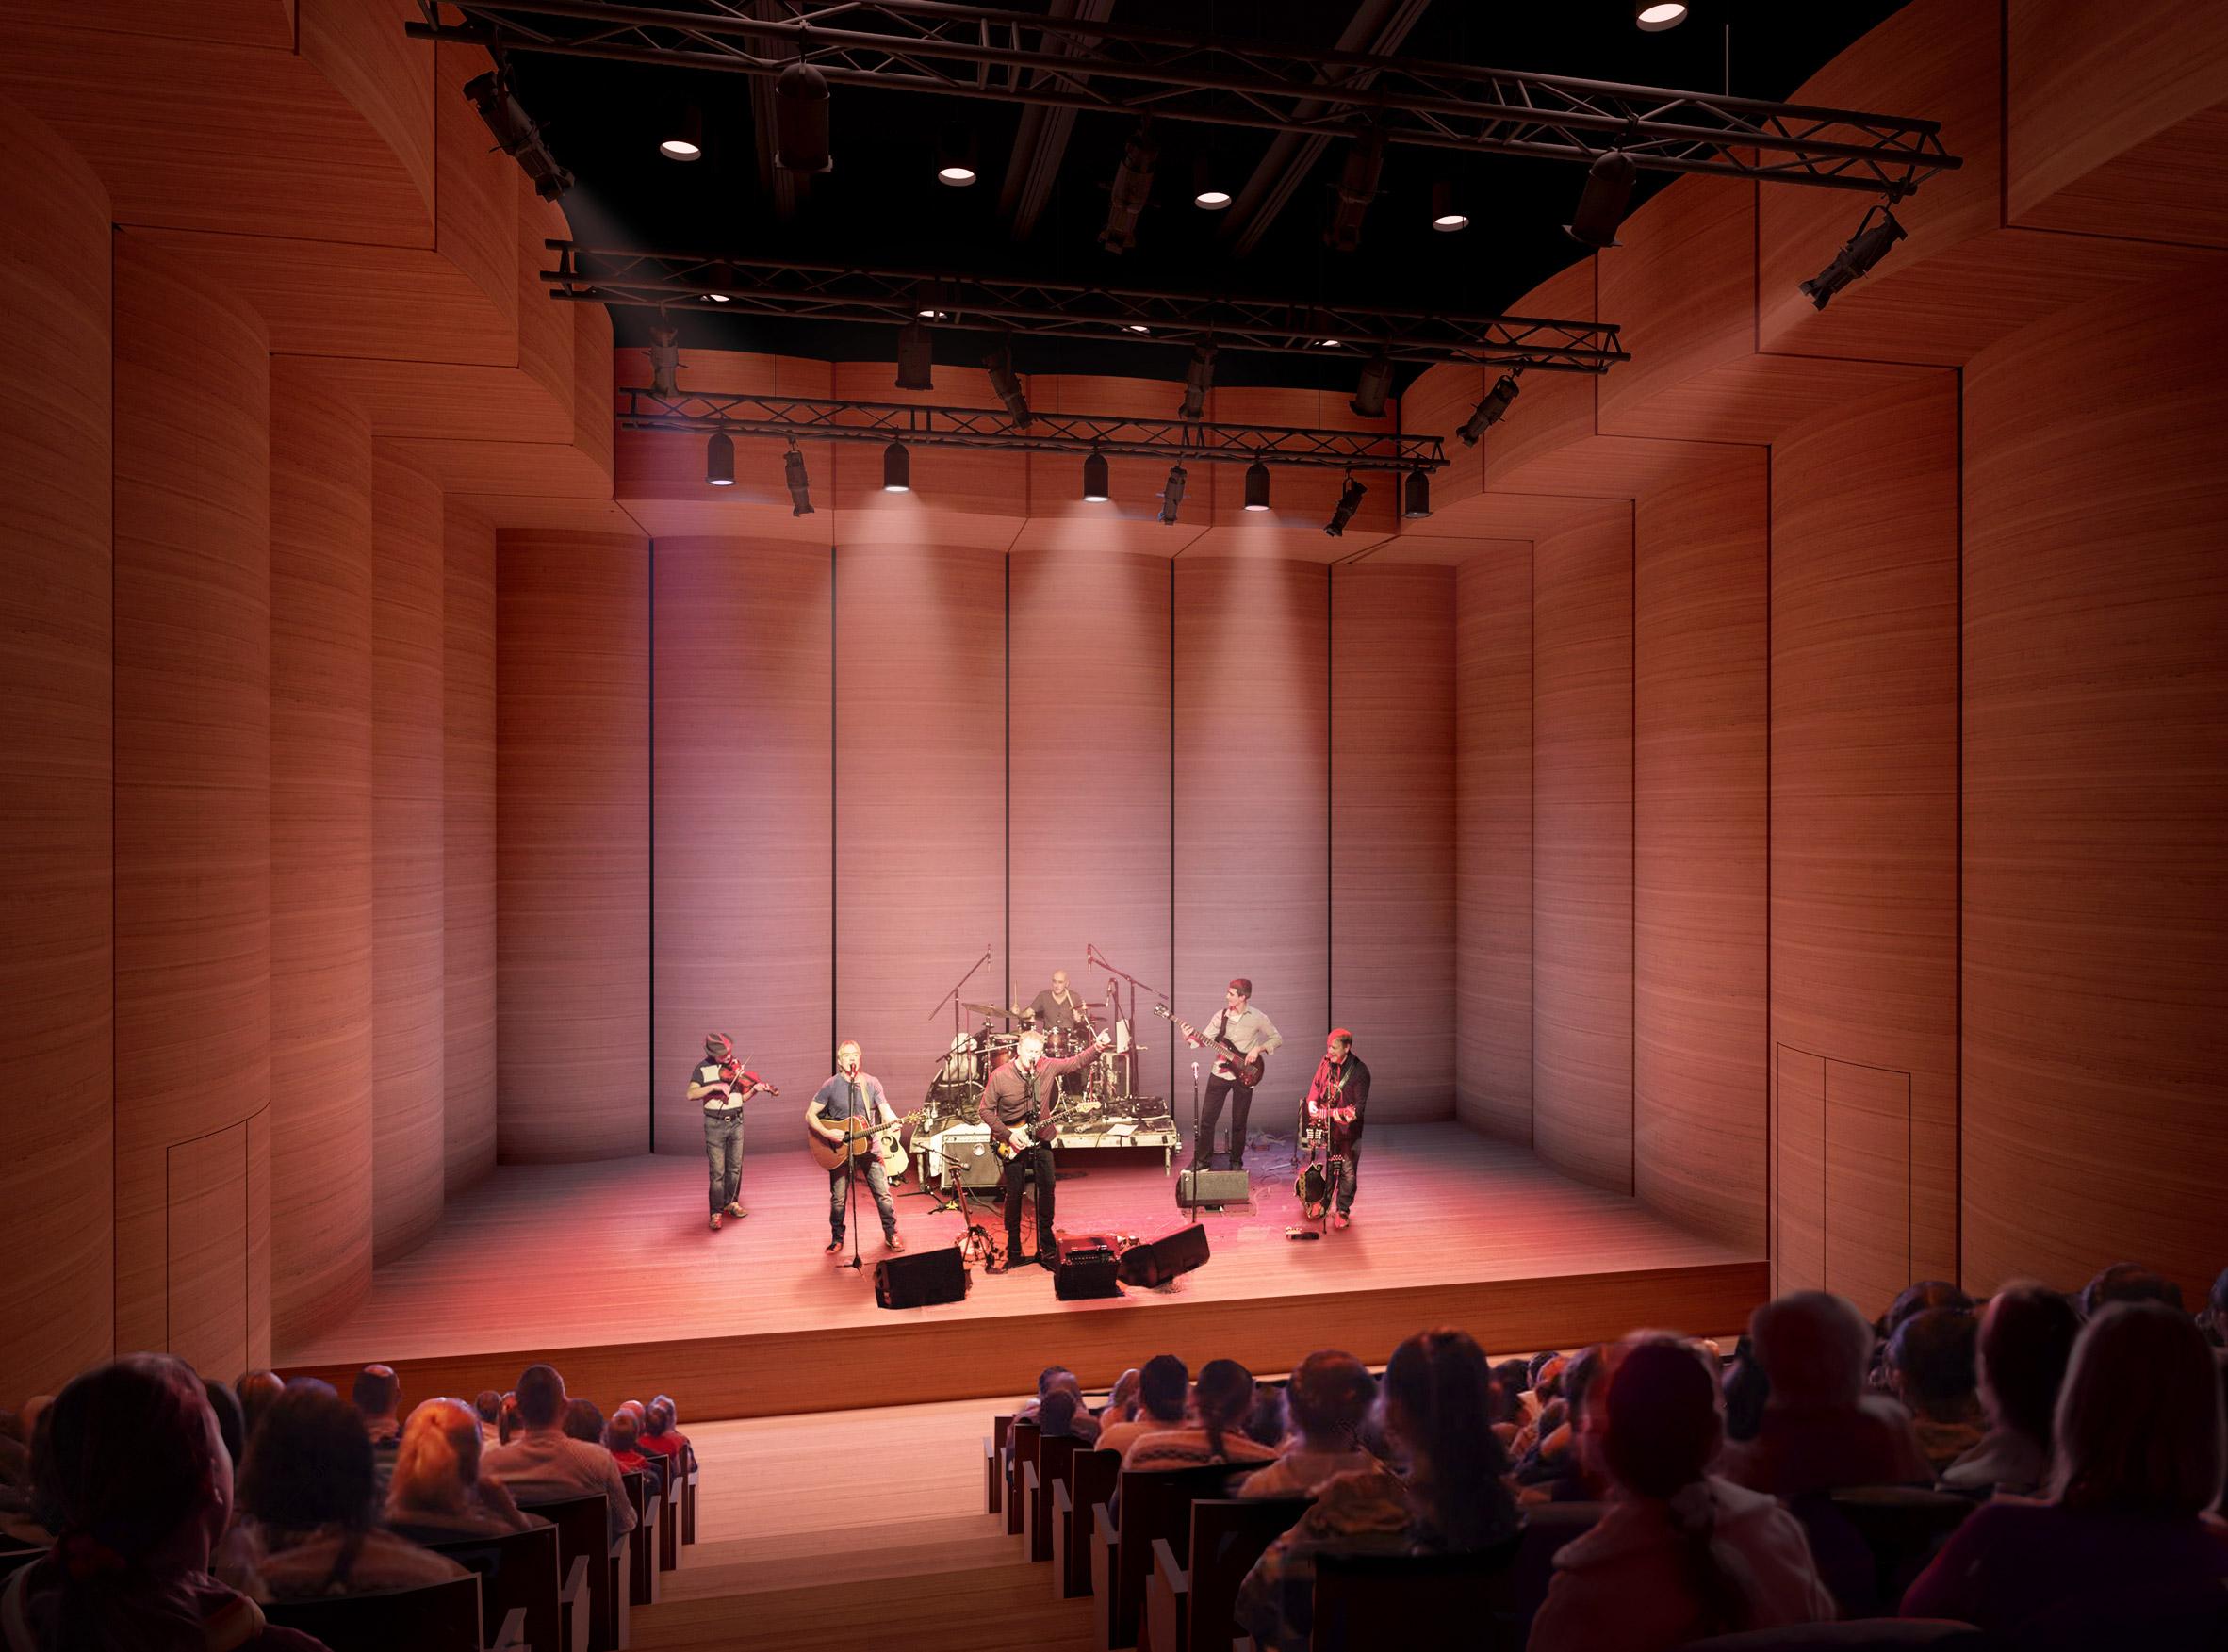 David Chipperfield reveals visuals of new Edinburgh concert hall